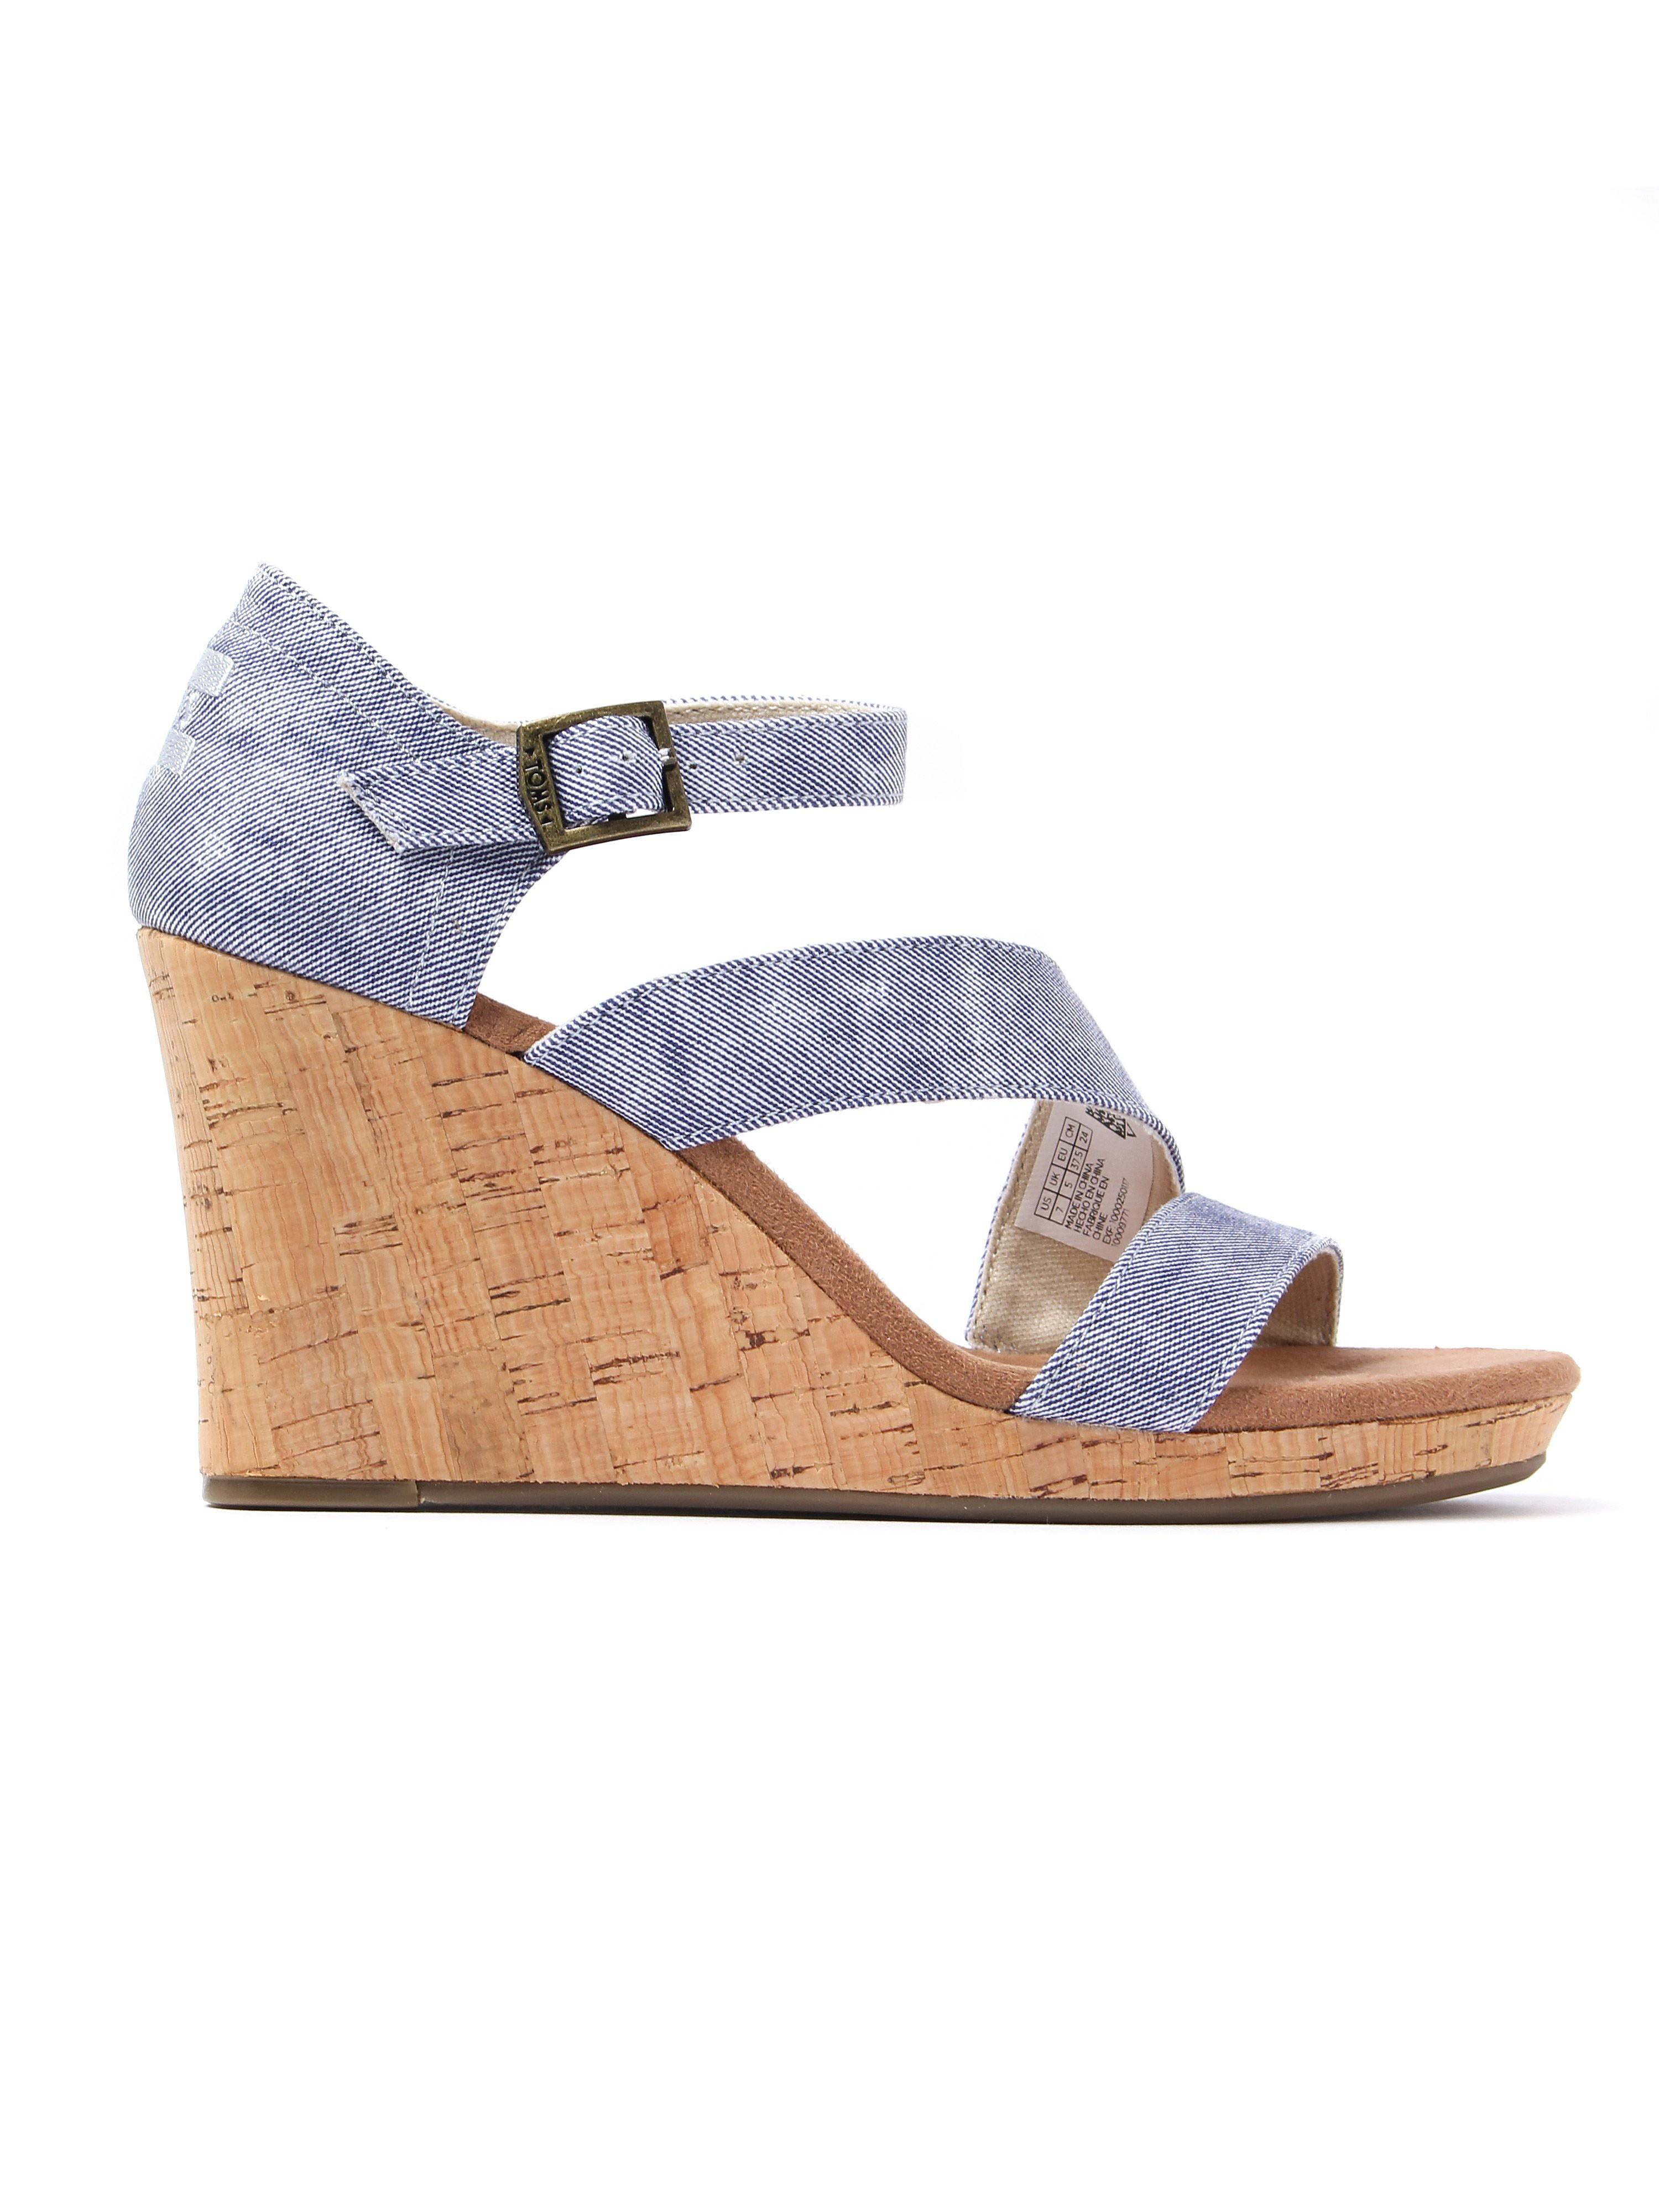 Toms Women's Clarissa Cork Sandals - Slate Blue